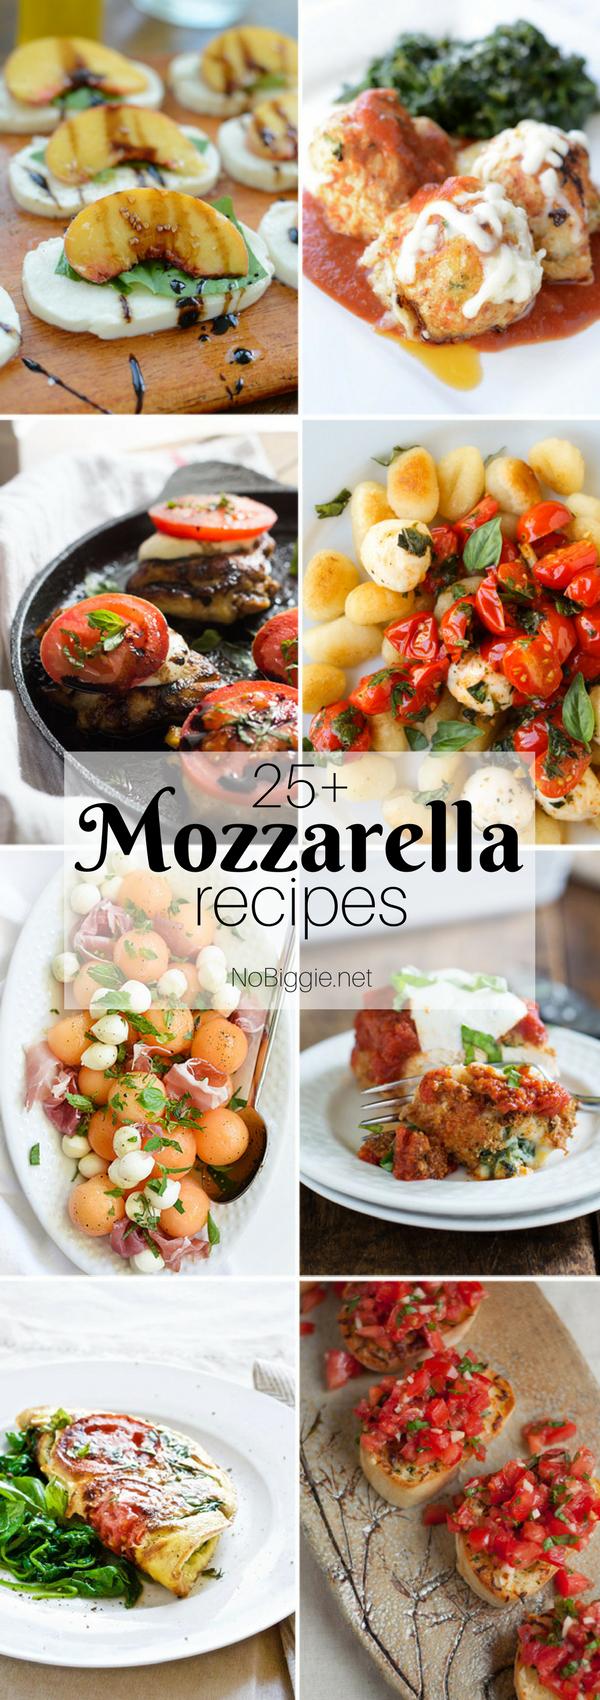 25+ Mozzarella Recipes   NoBiggie.net